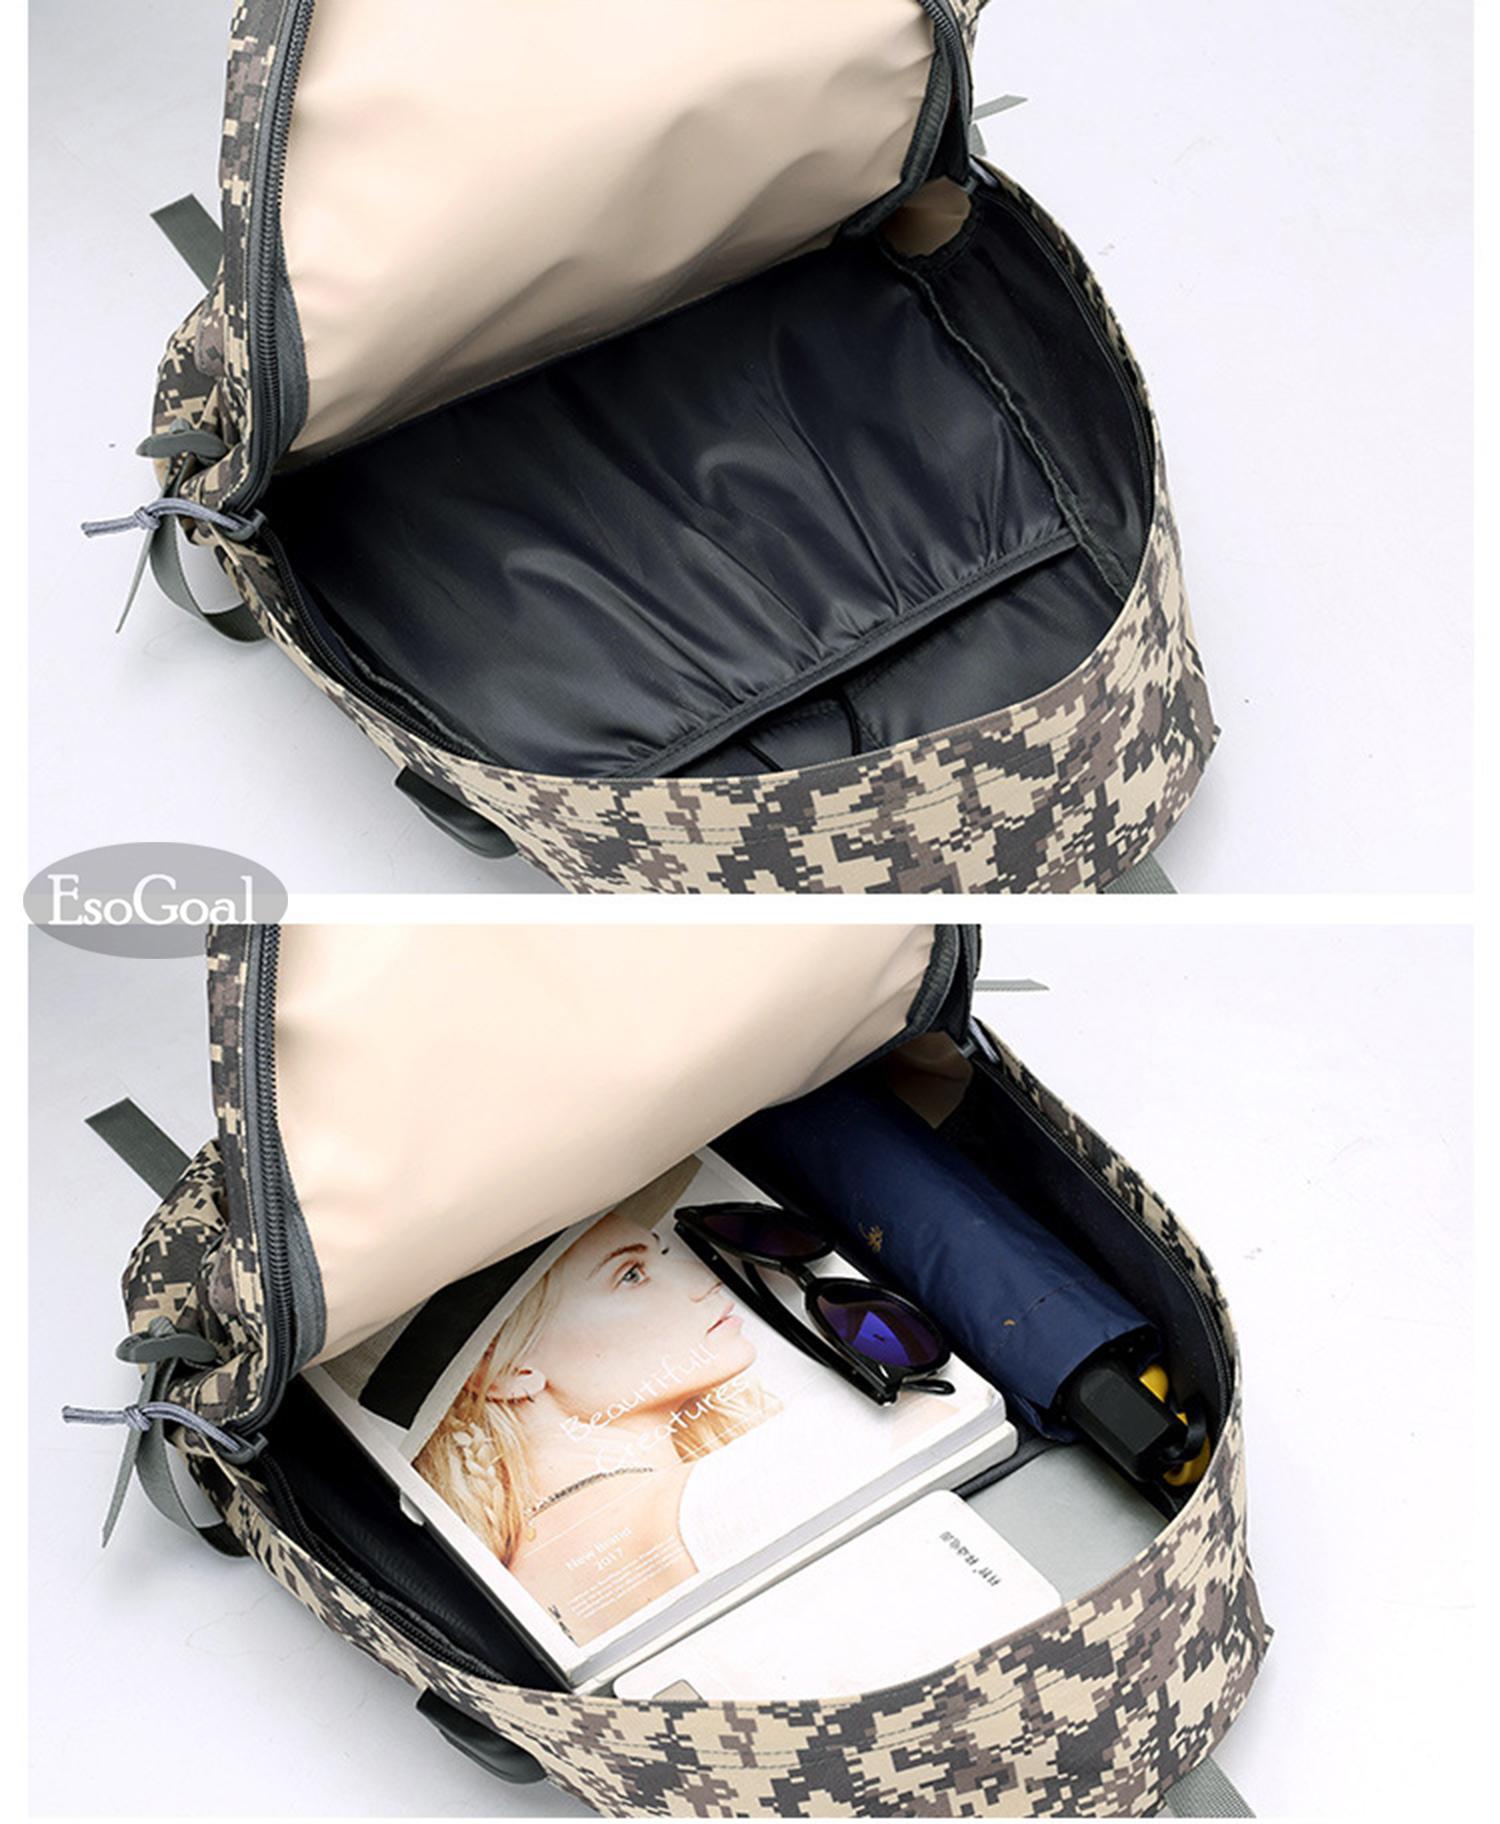 Detail Gambar EsoGoal Tas Ransel Pria Tas Travel Backpack Anti-Thief Travel Outdoor Business Casual 17.3 Inch Waterproof Laptop Backpack For Men Women ...